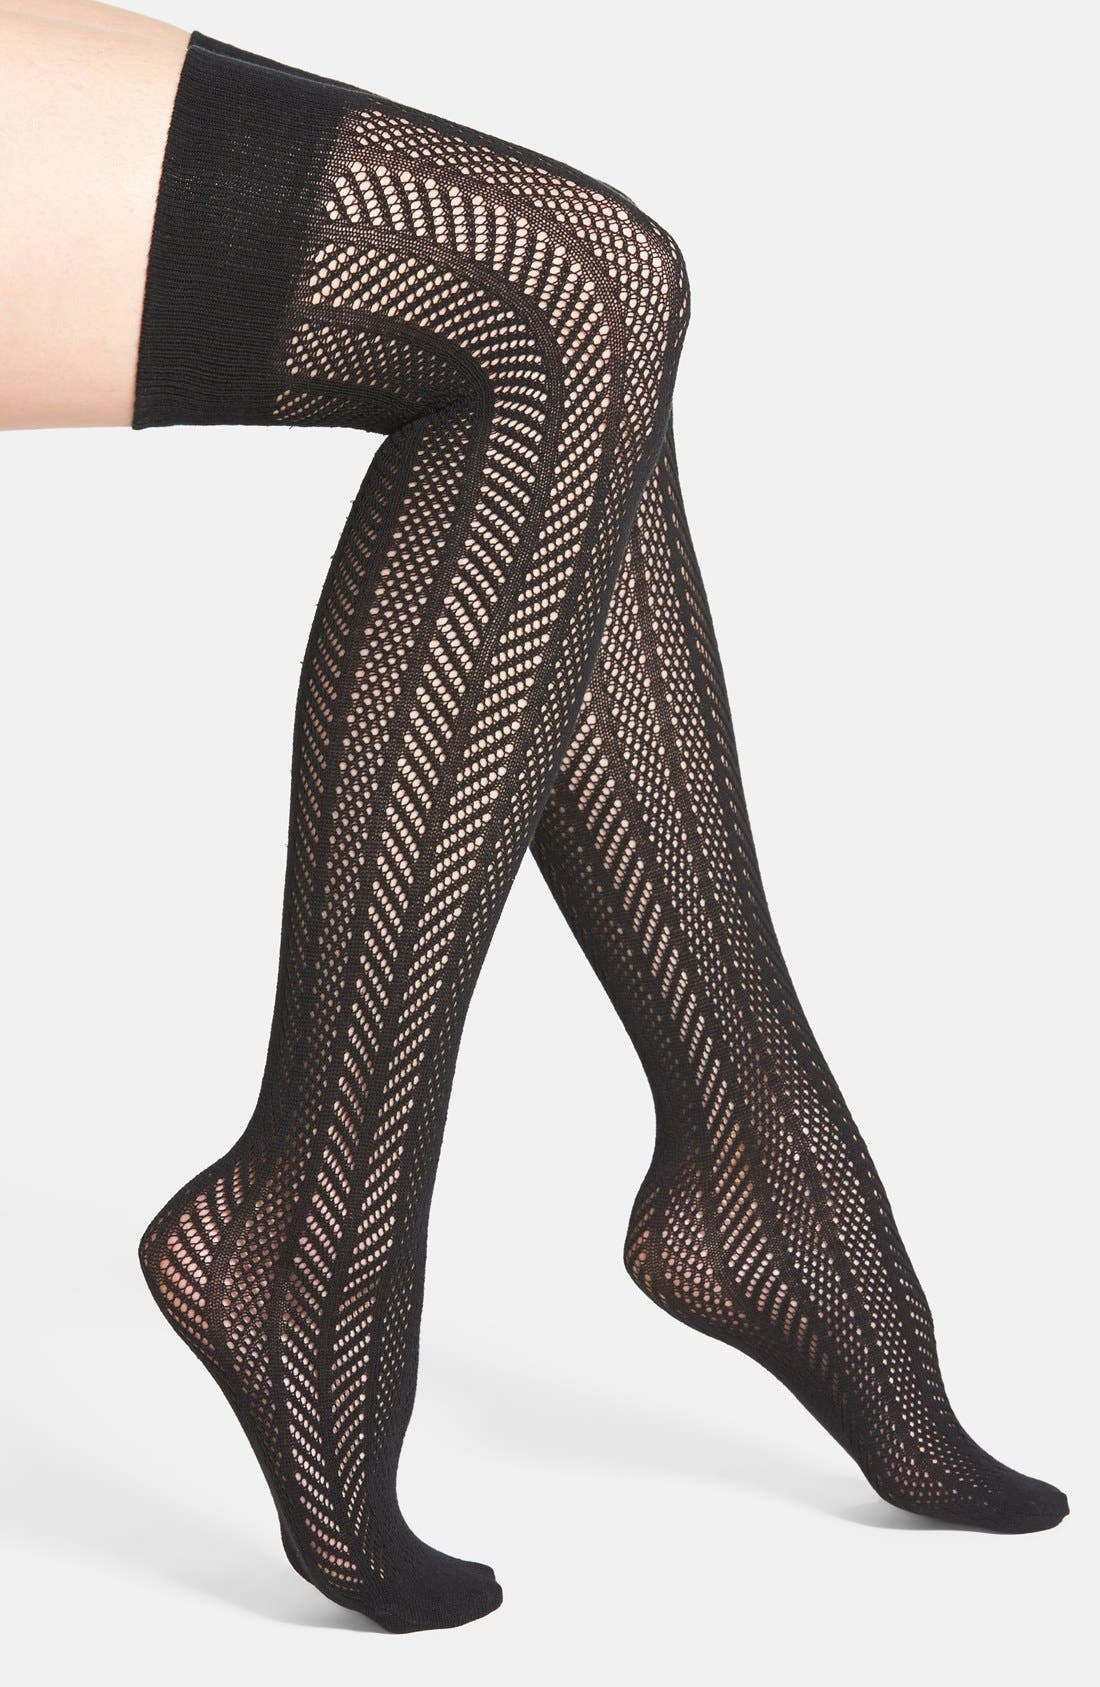 Openwork Knit Thigh High Socks,                             Main thumbnail 1, color,                             001